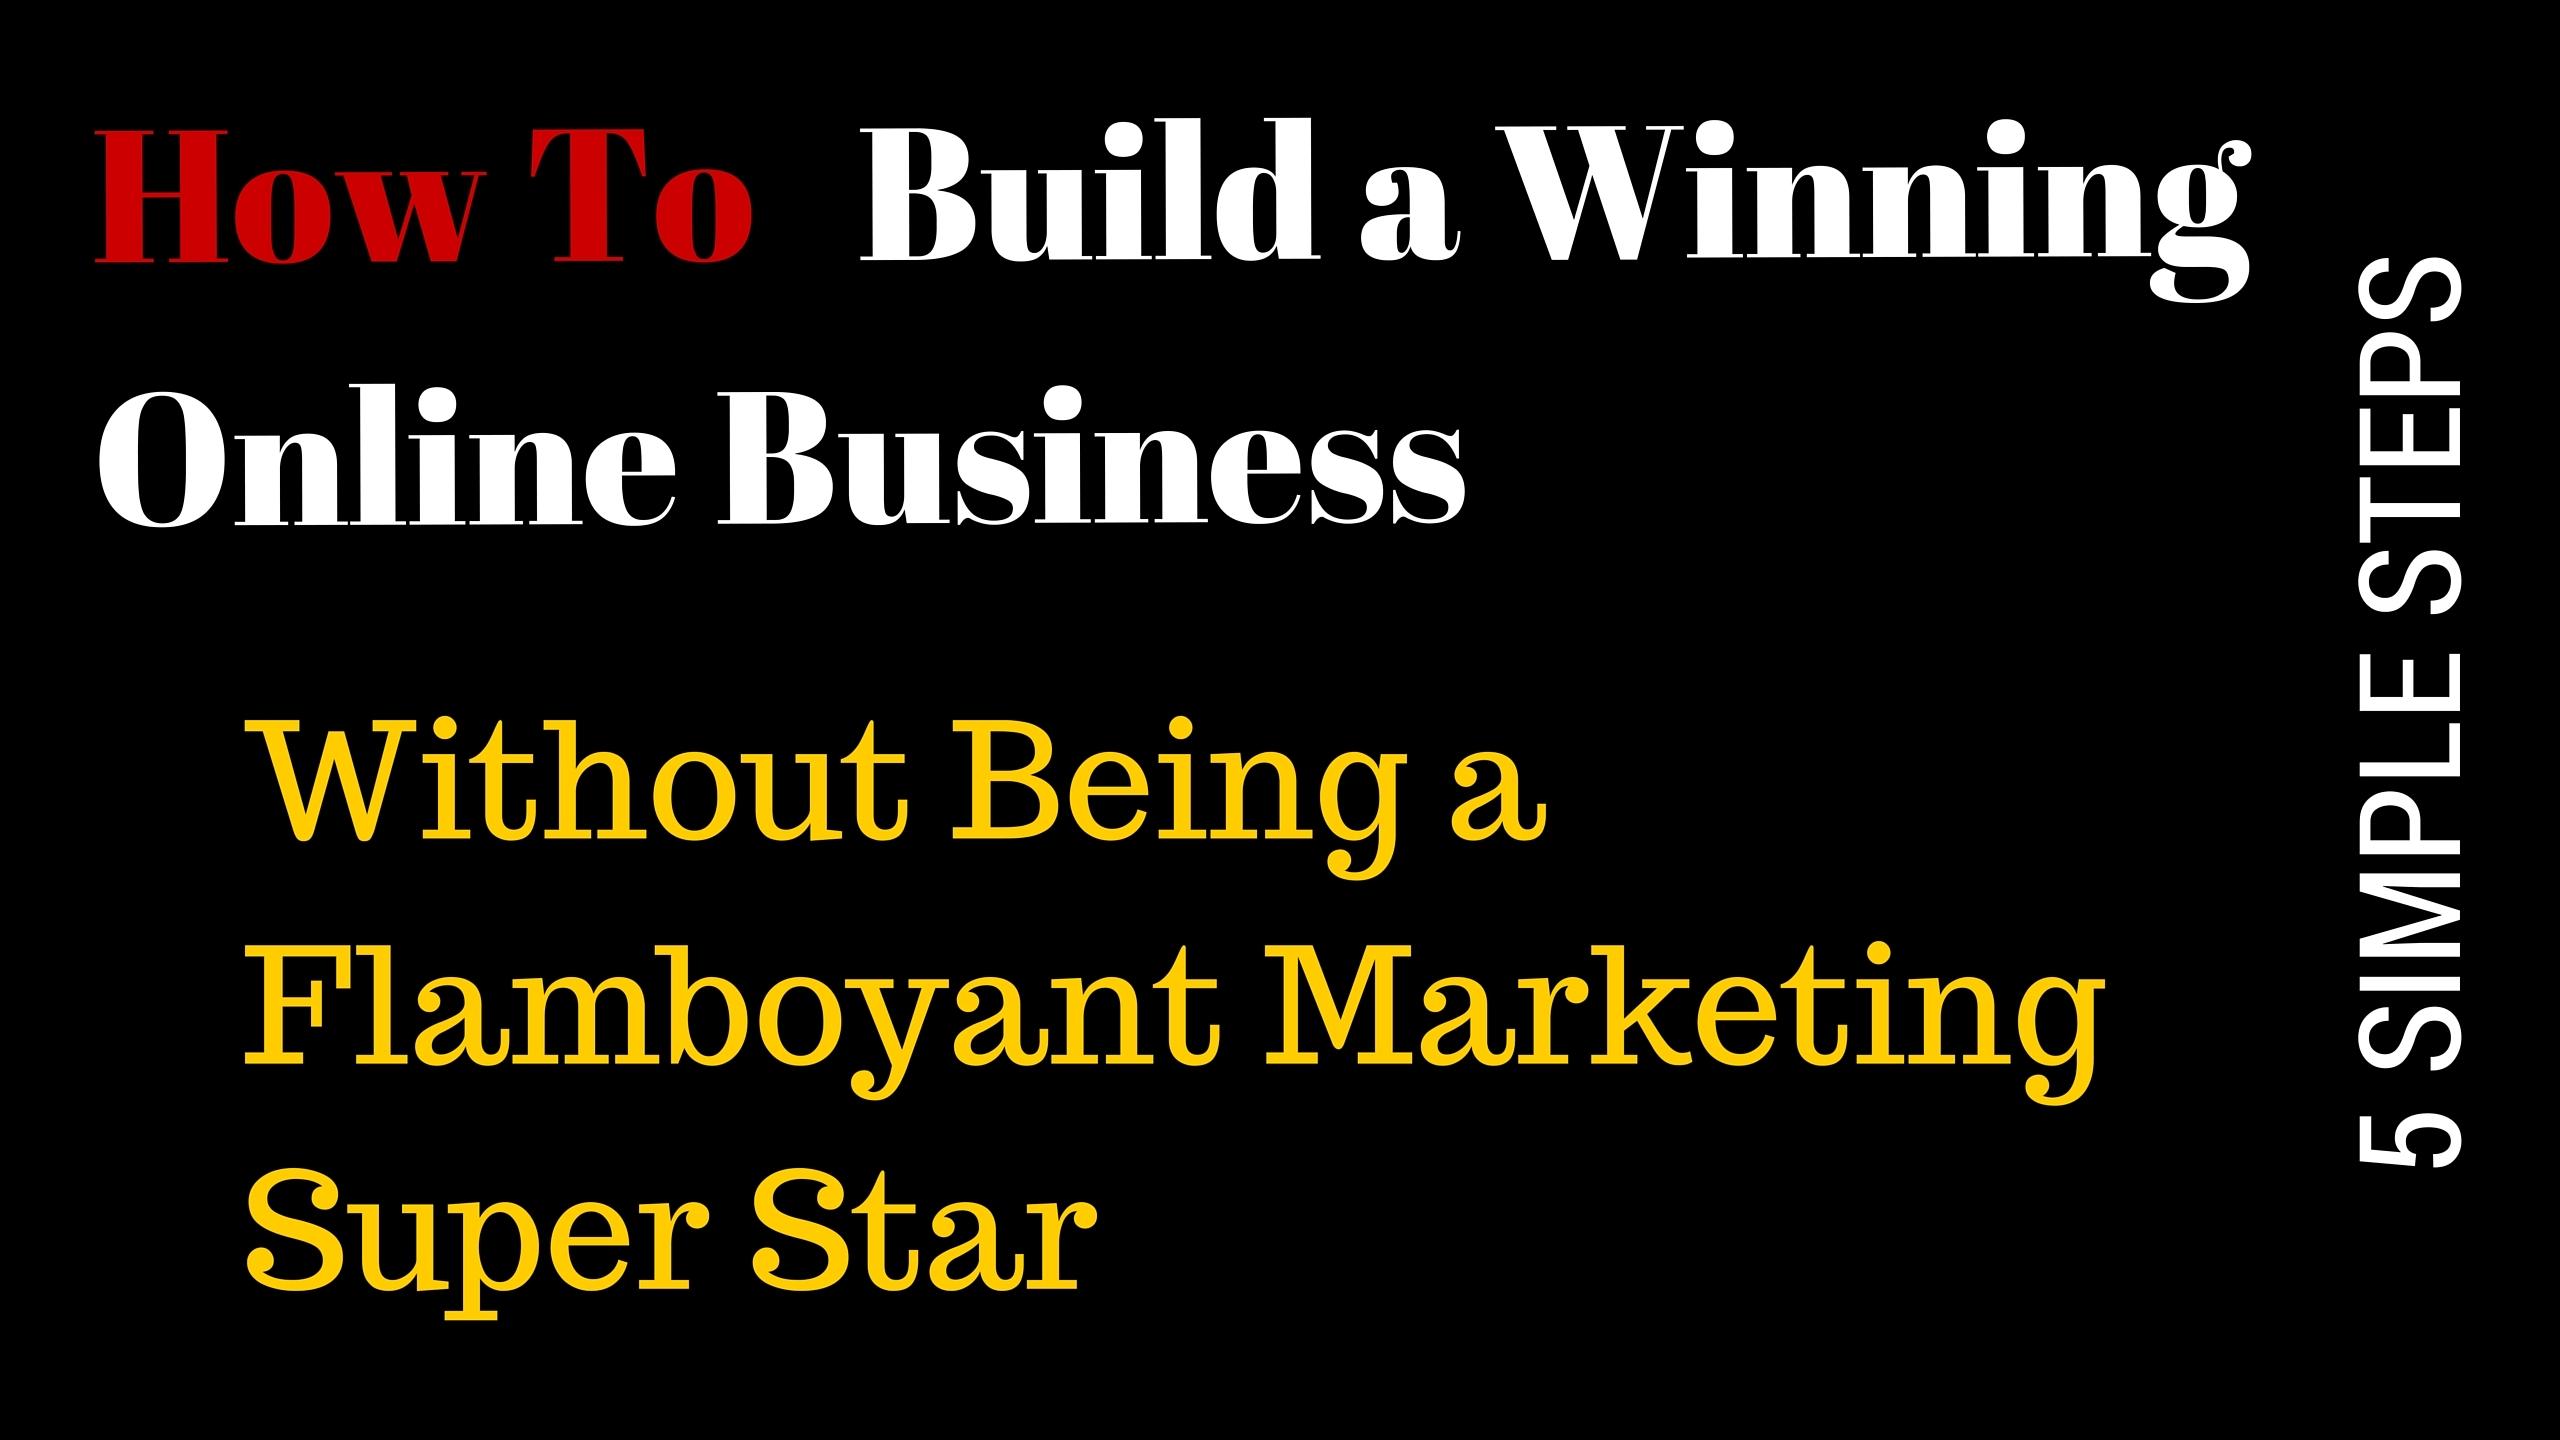 Build Winning Online Business